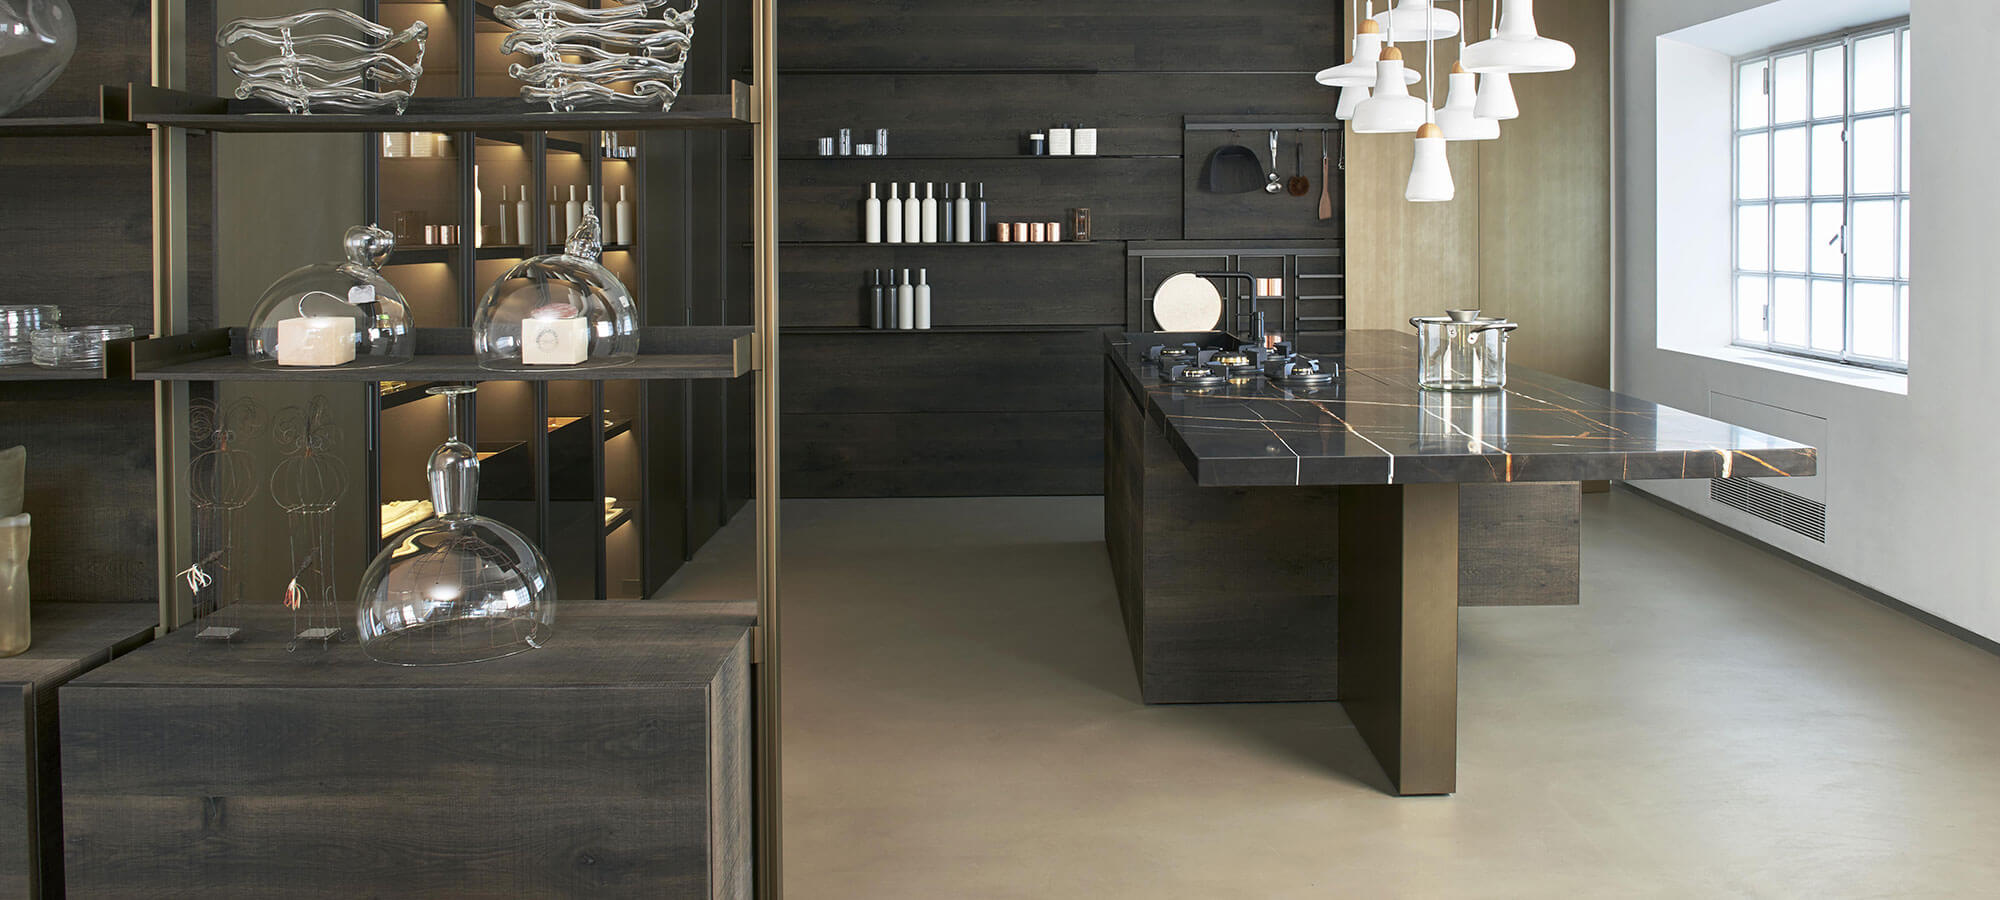 Estivale-Kitchen-002